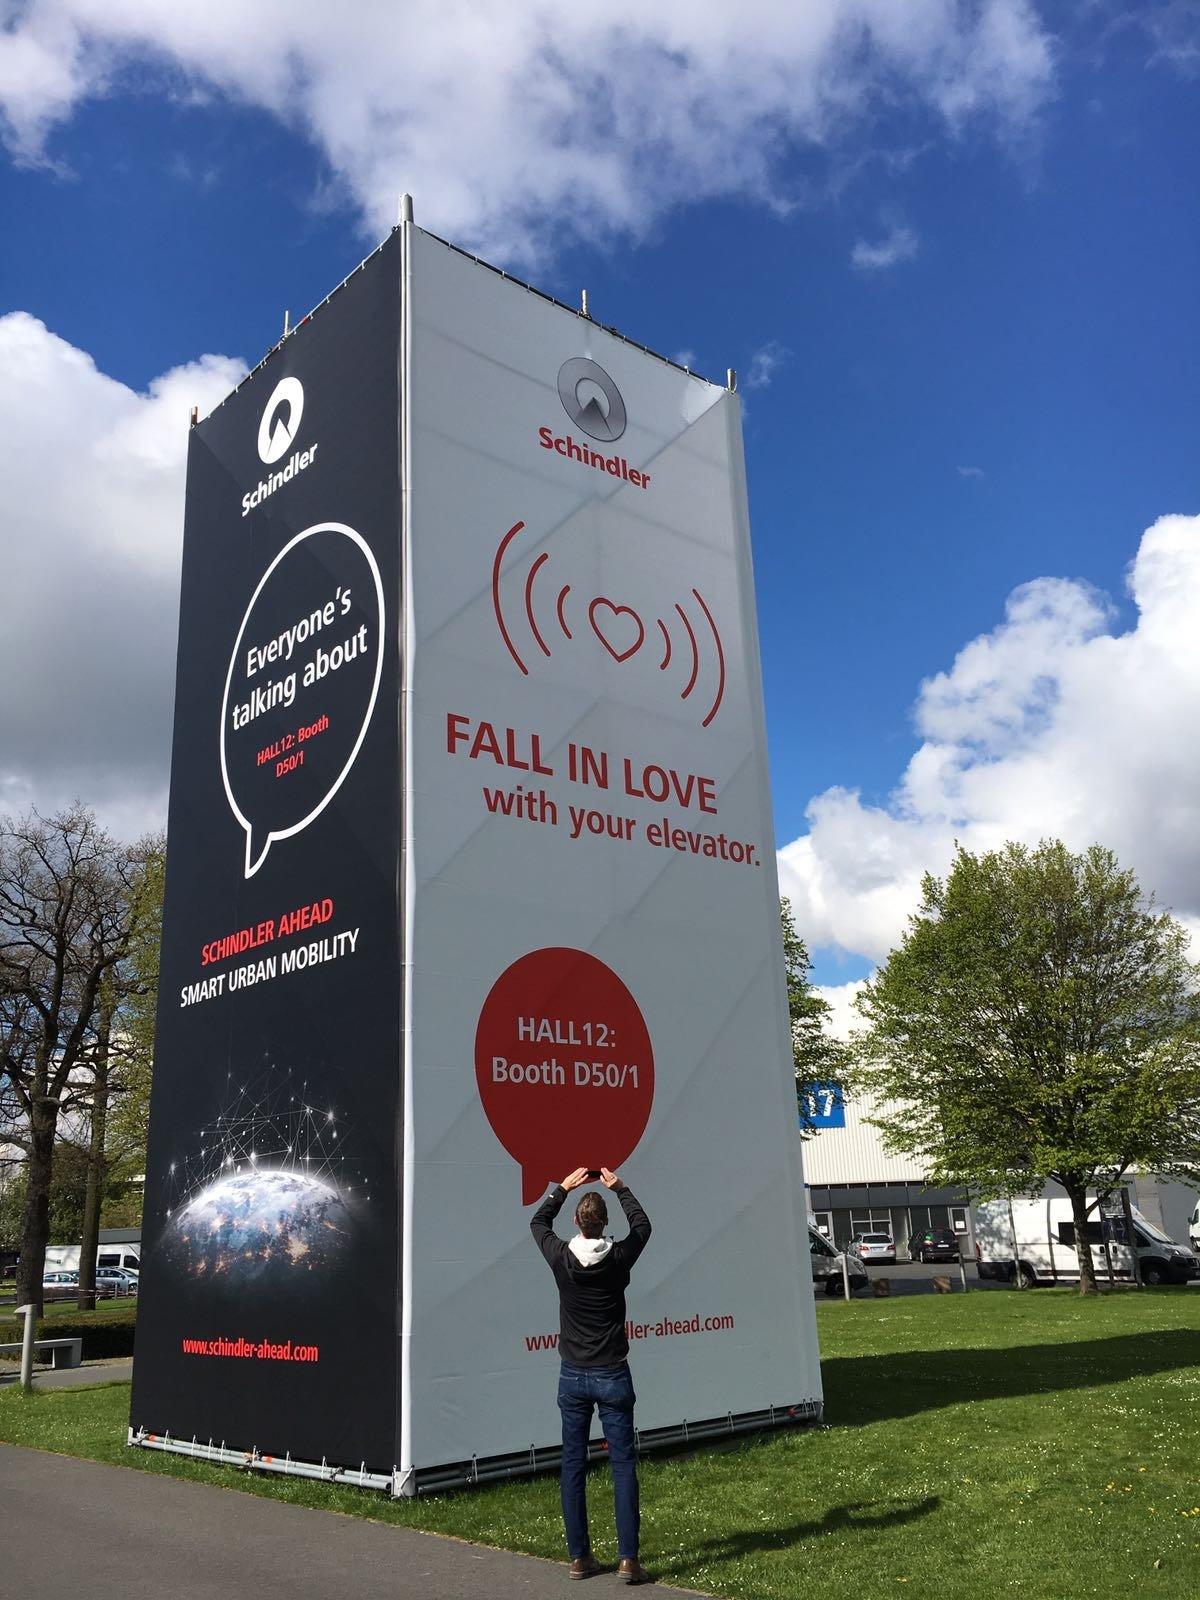 Hallo @hannover_messe, wir kommen! Unser Turm steht schon. Seid dabei unter https://t.co/Dj45f4QRyA #HM17 #IoT #Mobility https://t.co/QC3e4FYaSO